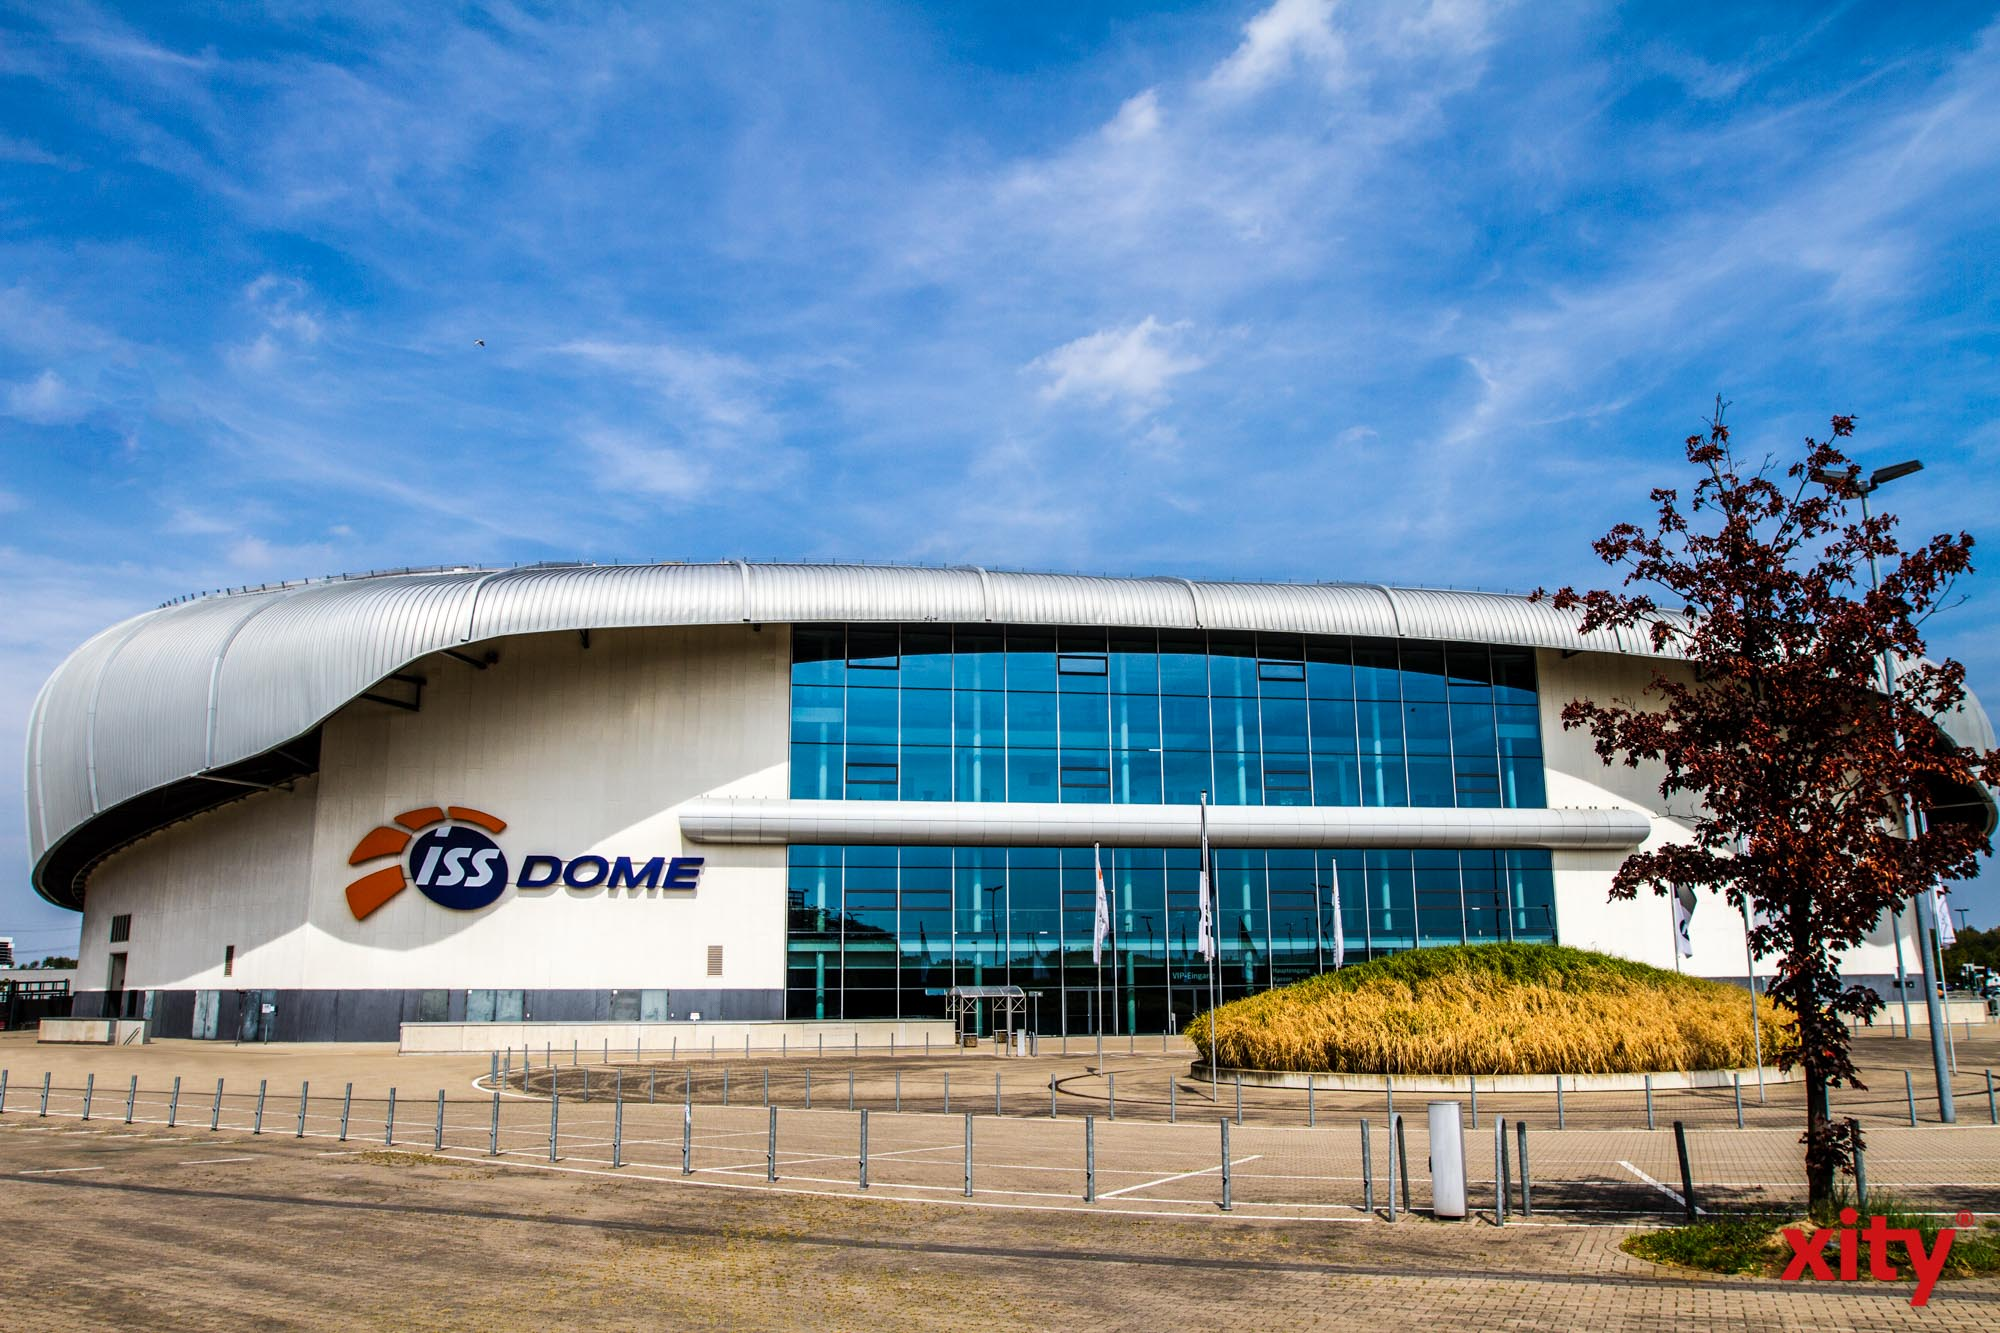 Rat der Landeshauptstadt tagt heute im ISS Dome (Foto: xity)